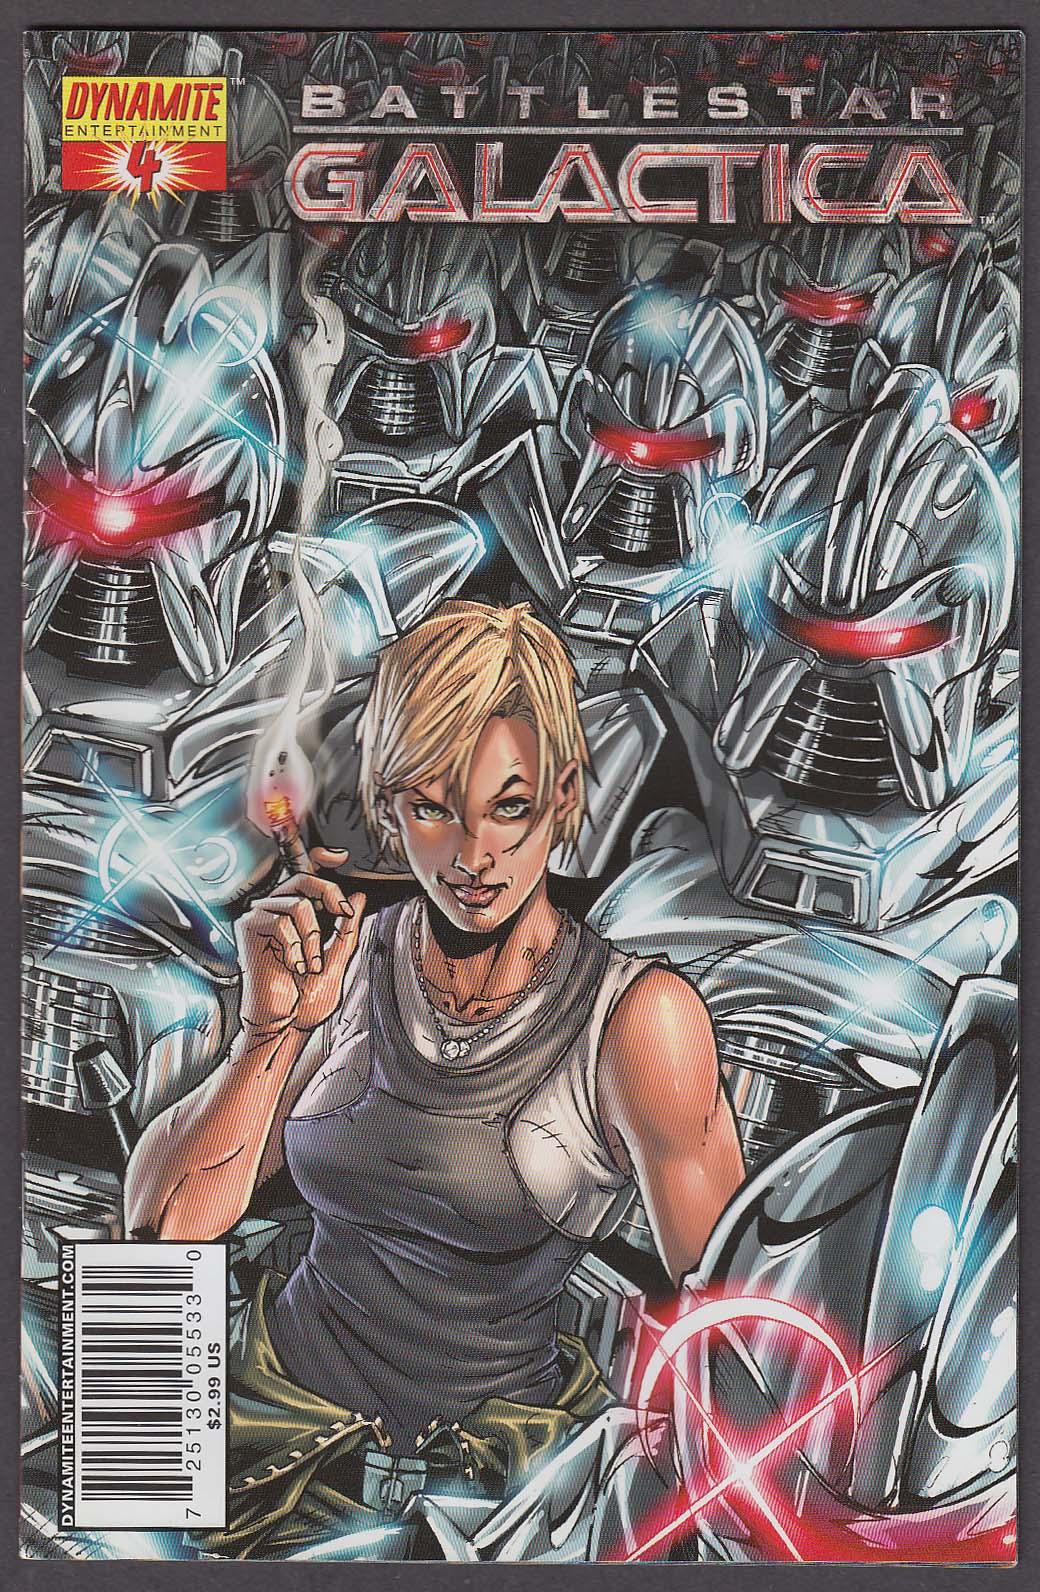 BATTLESTAR GALACTICA #4 Dynamite comic book 2006 1st Printing